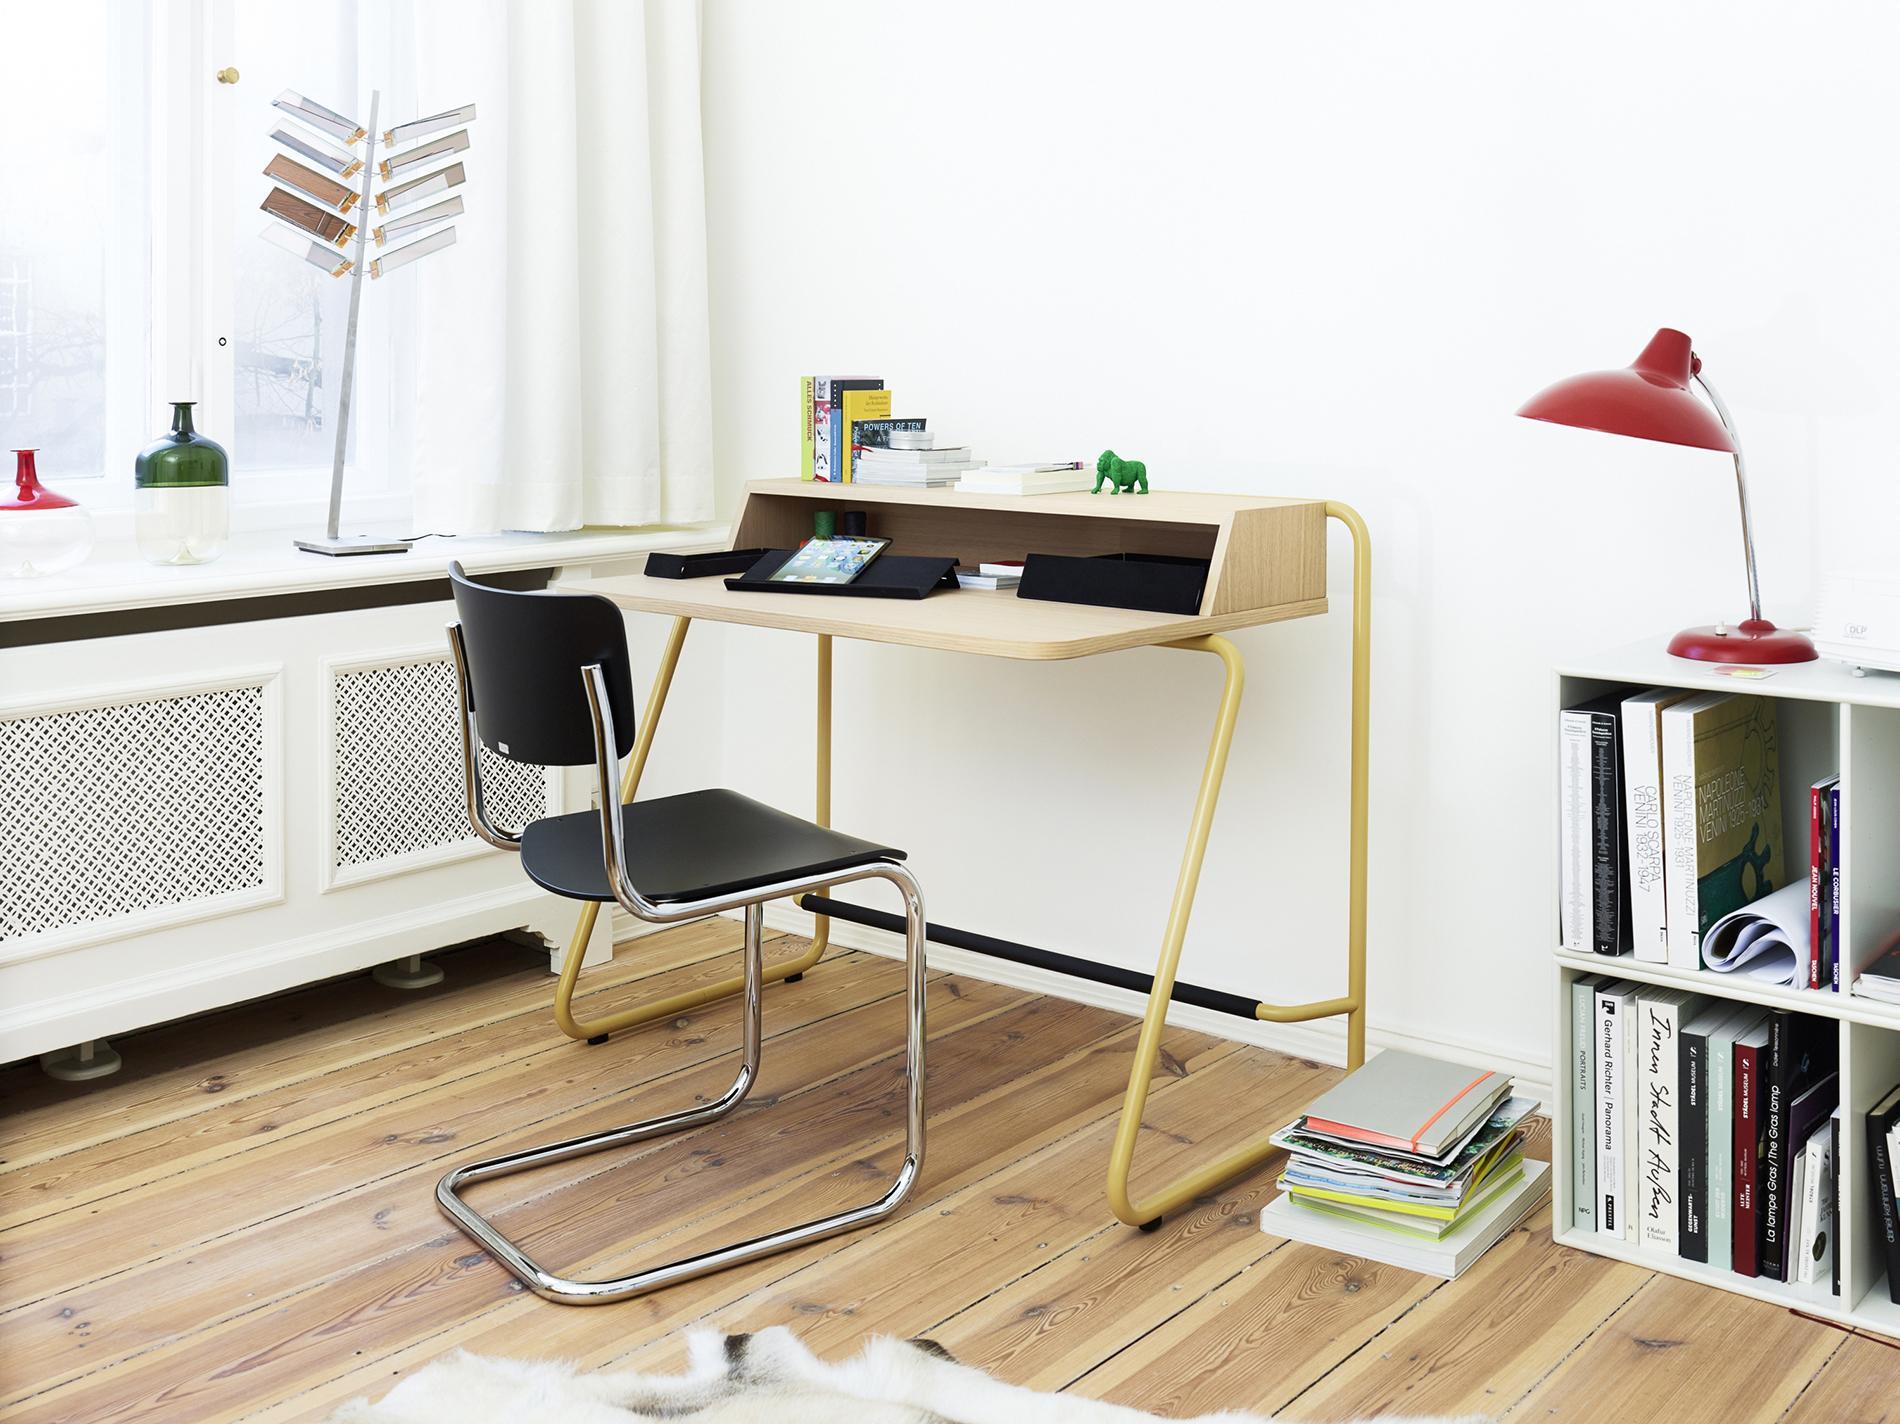 Home office : 10 façons daménager un joli coin bureau chez soi